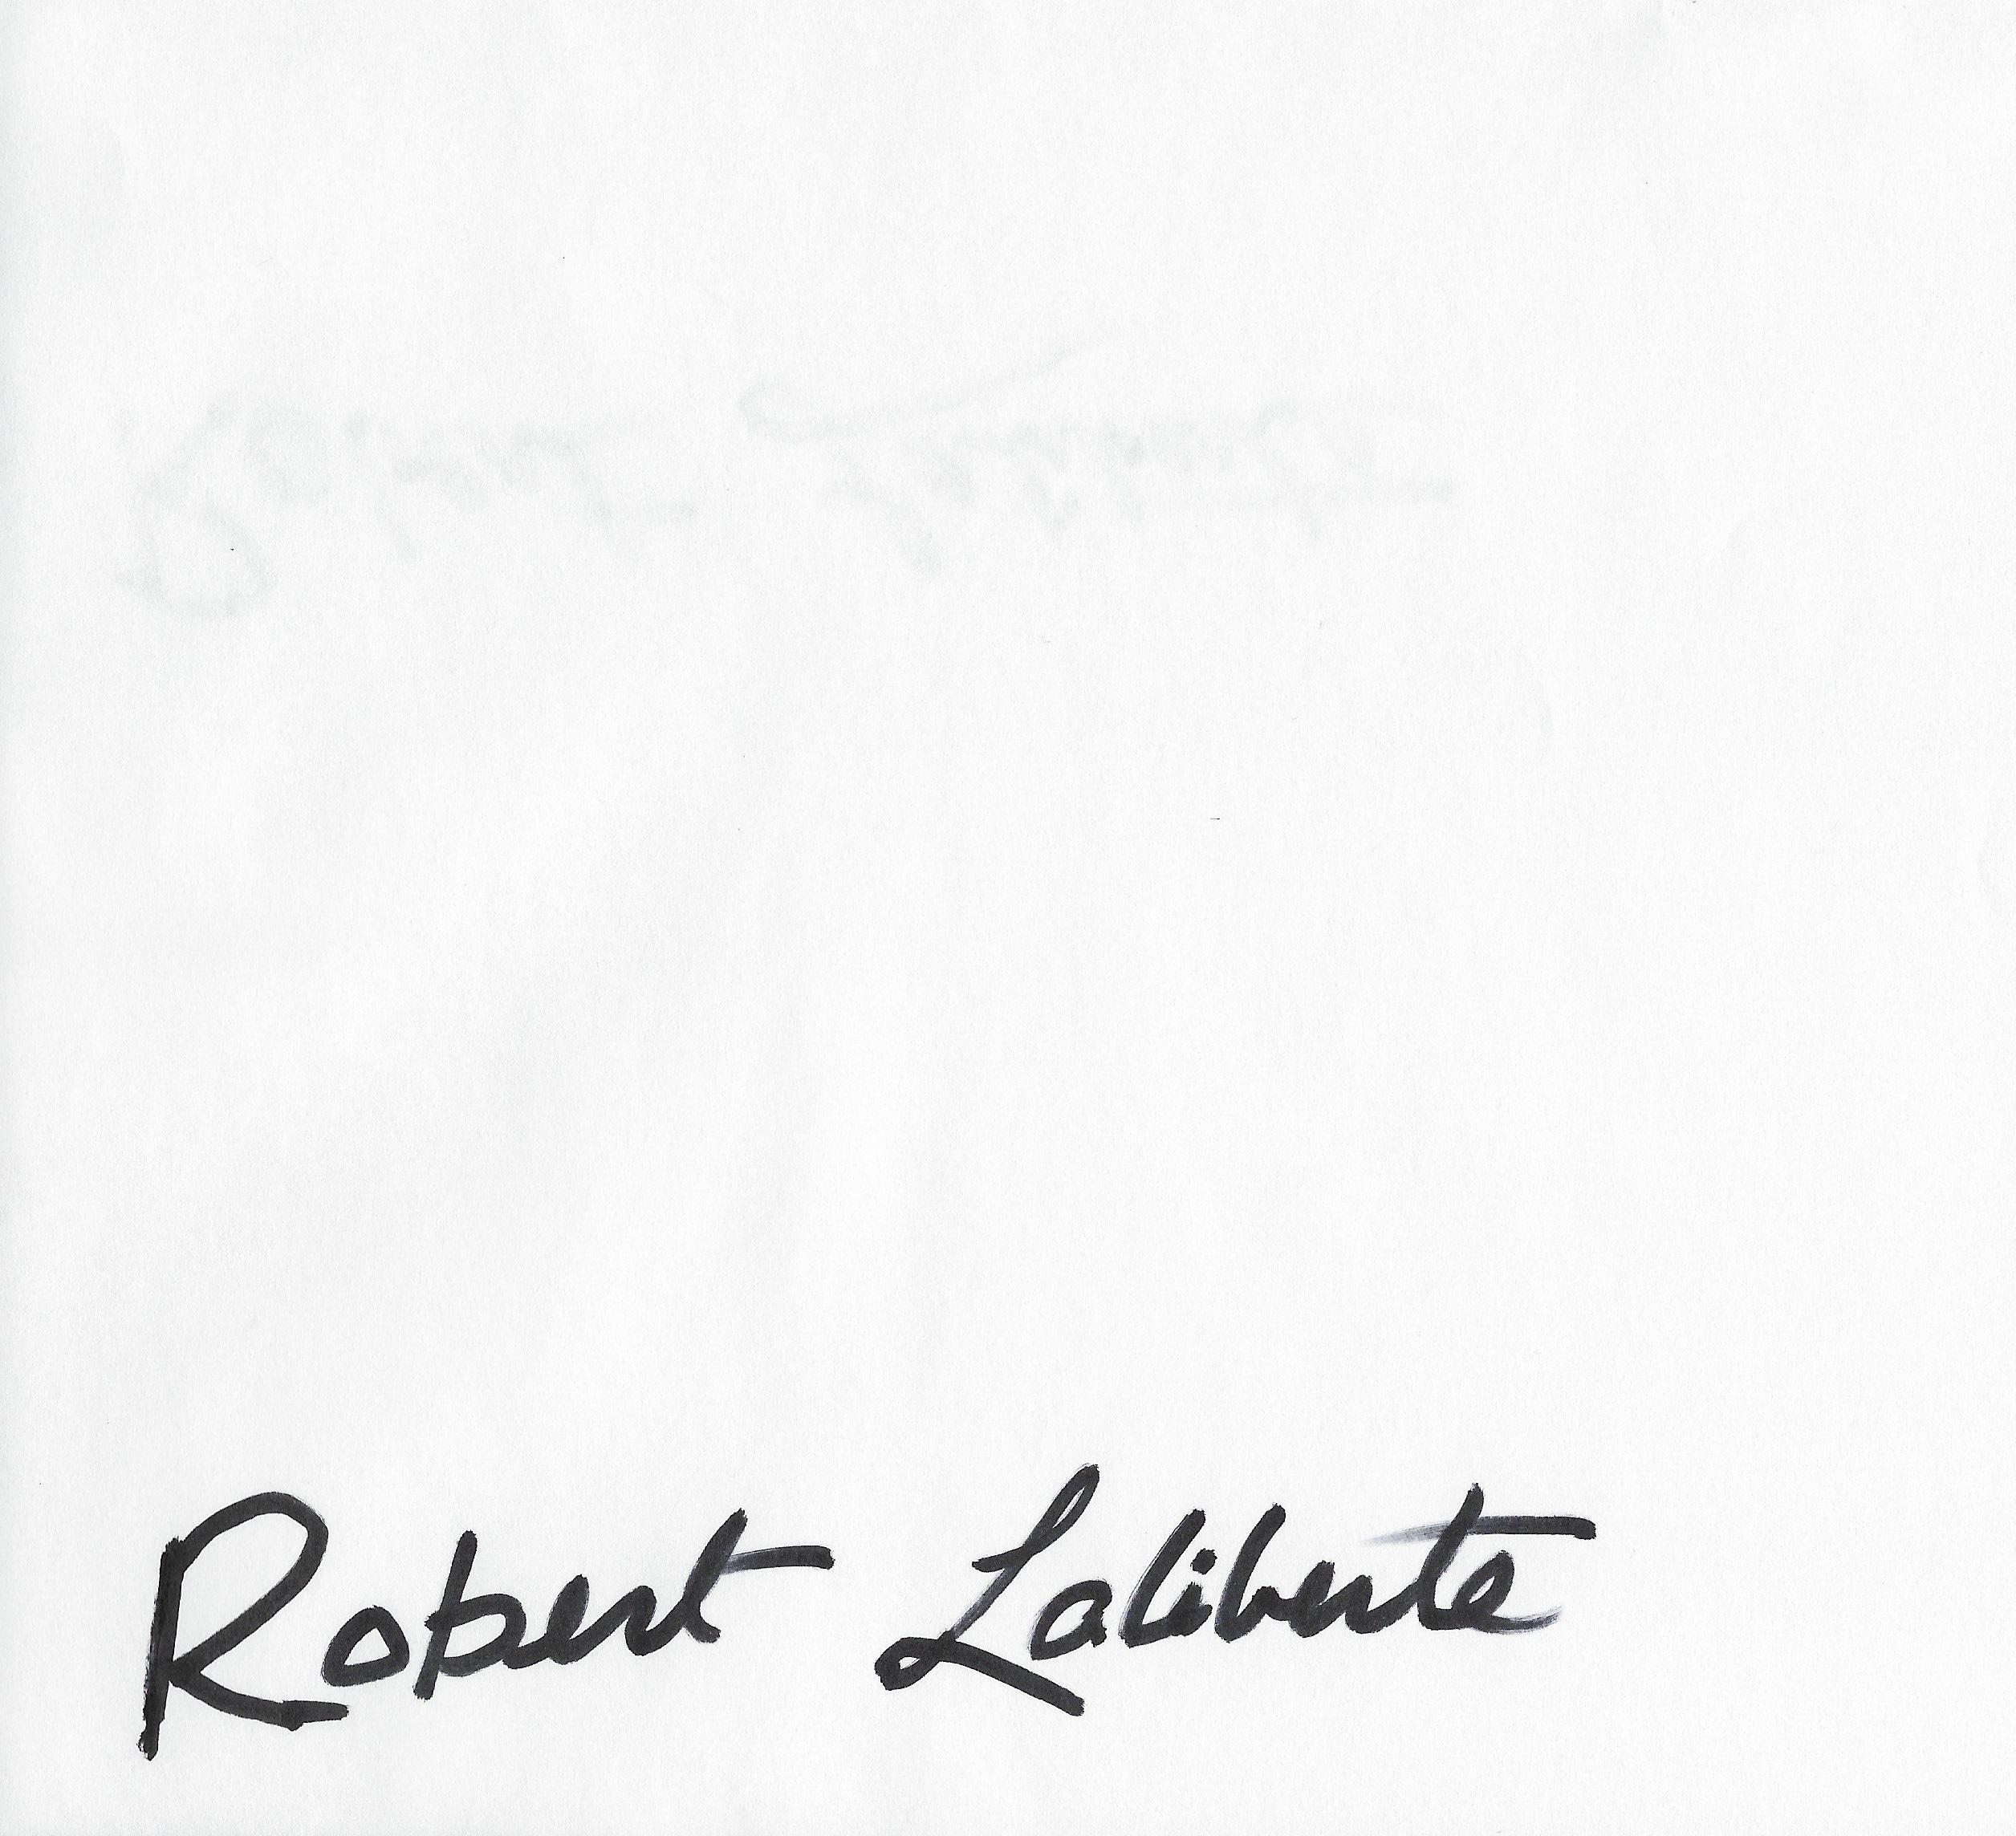 Robert laliberte's Signature